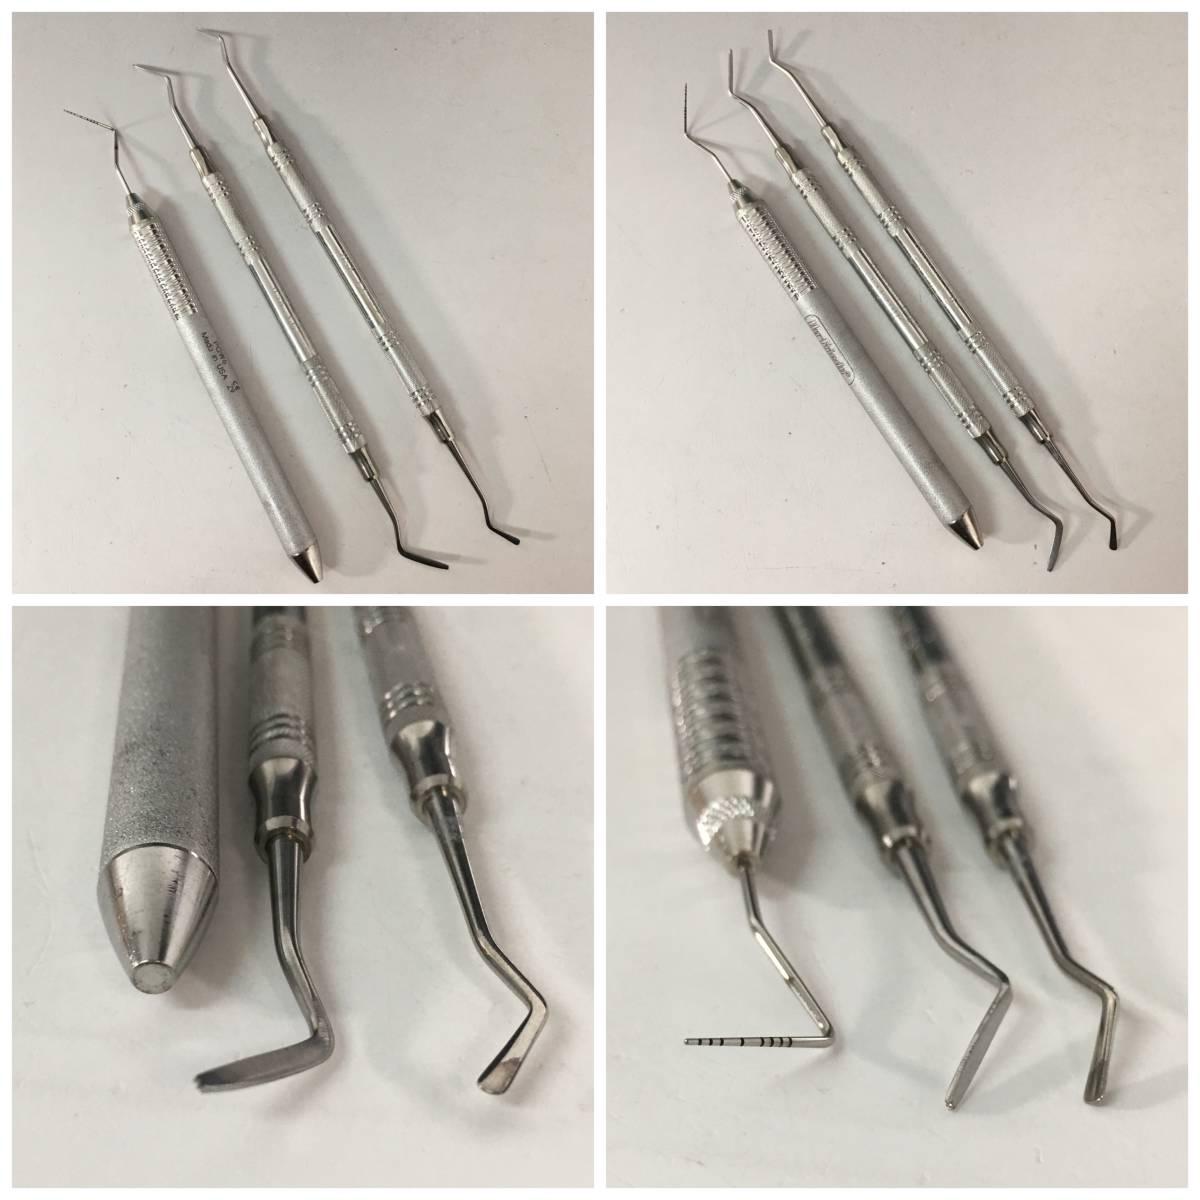 ha1/1 歯科技工 19点セット MILTEX/AMERICAN EAGLE/HU-FRIEDY/HENRY SCHEIN等 鉗子 ピンセット スケーラ インプラント 口腔外科